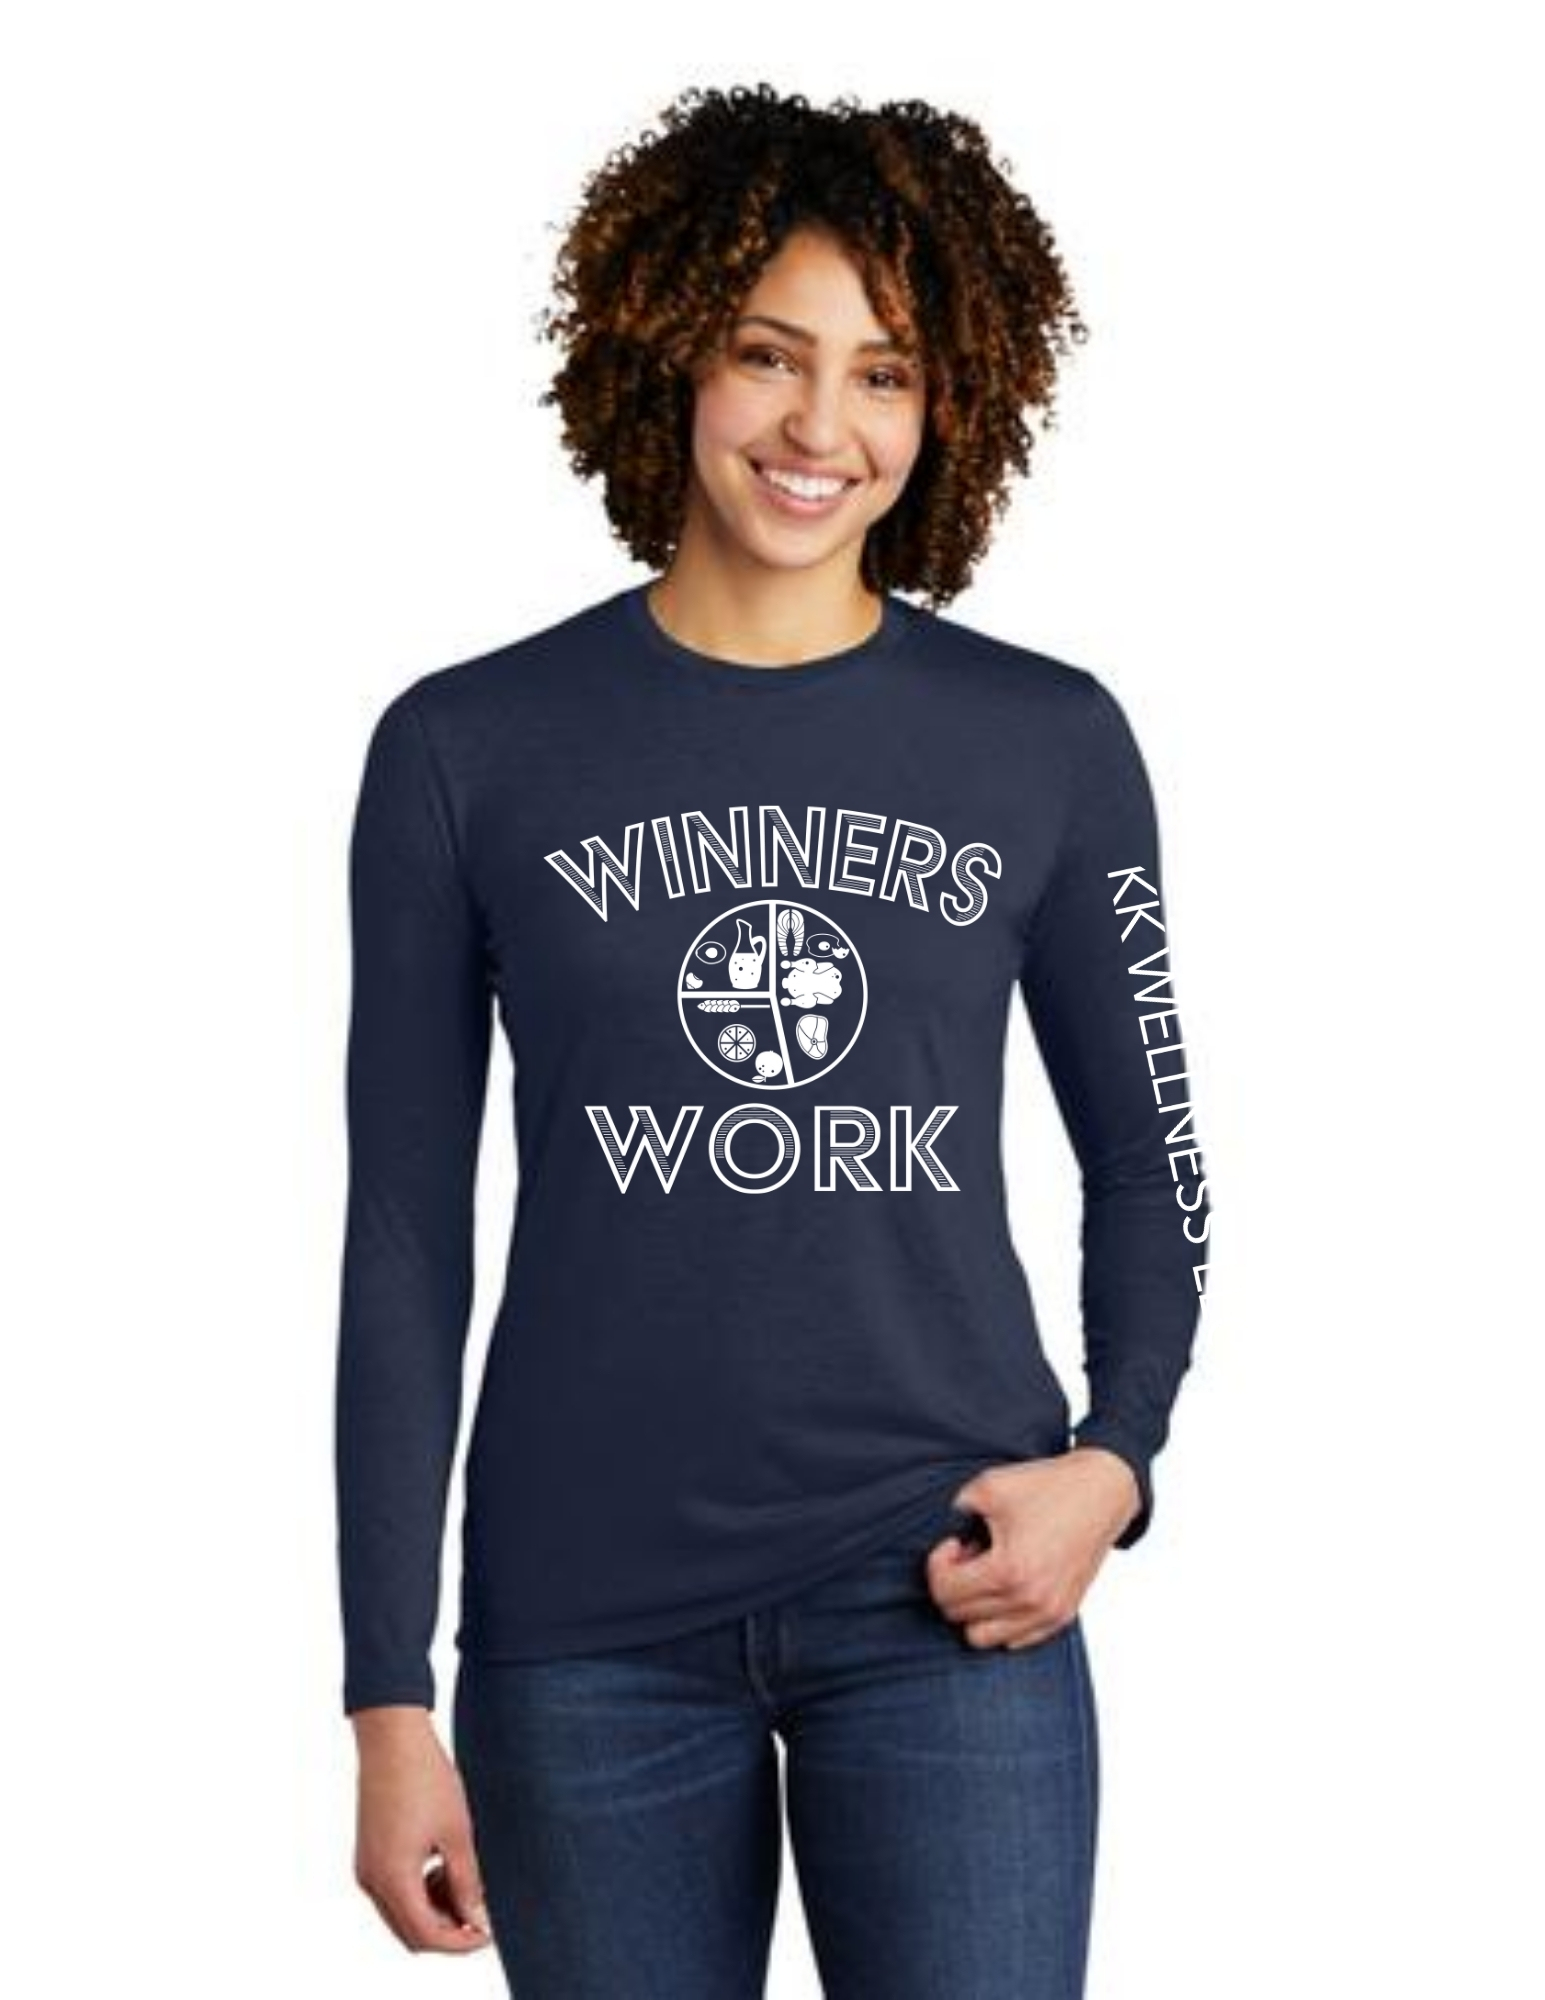 Winners Work Allmade Long Sleeve Tri-Blend